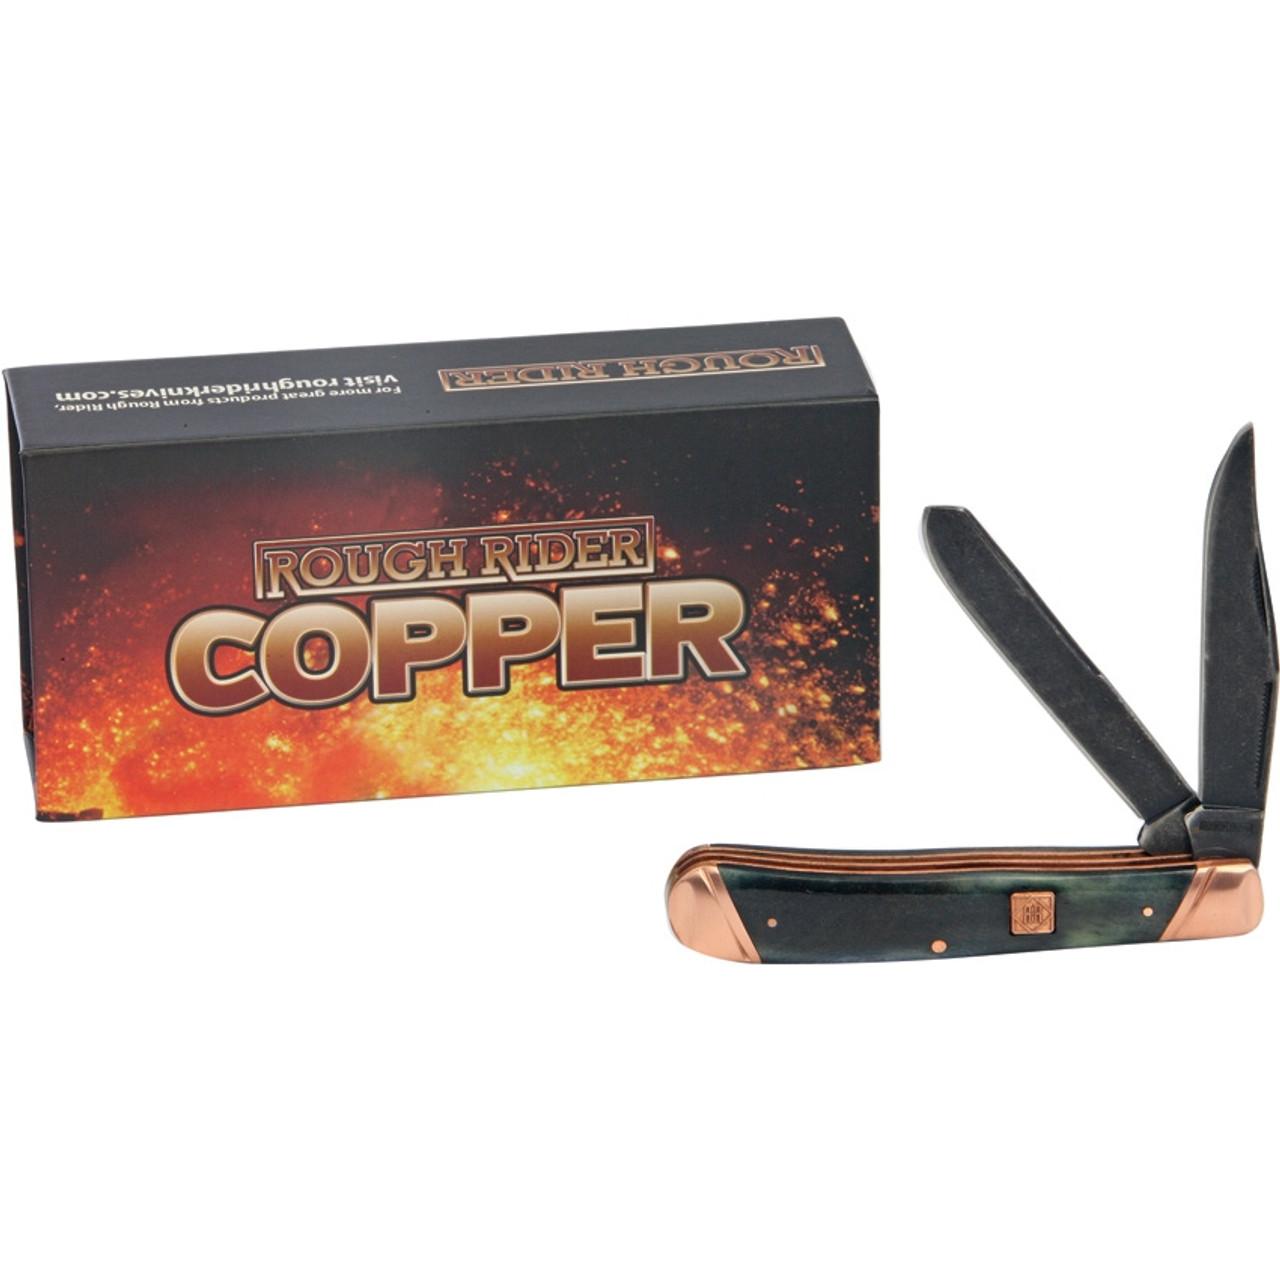 Rough Ryder Trapper, RR1584, Black Smooth Bone Handle w/ Copper Bolsters